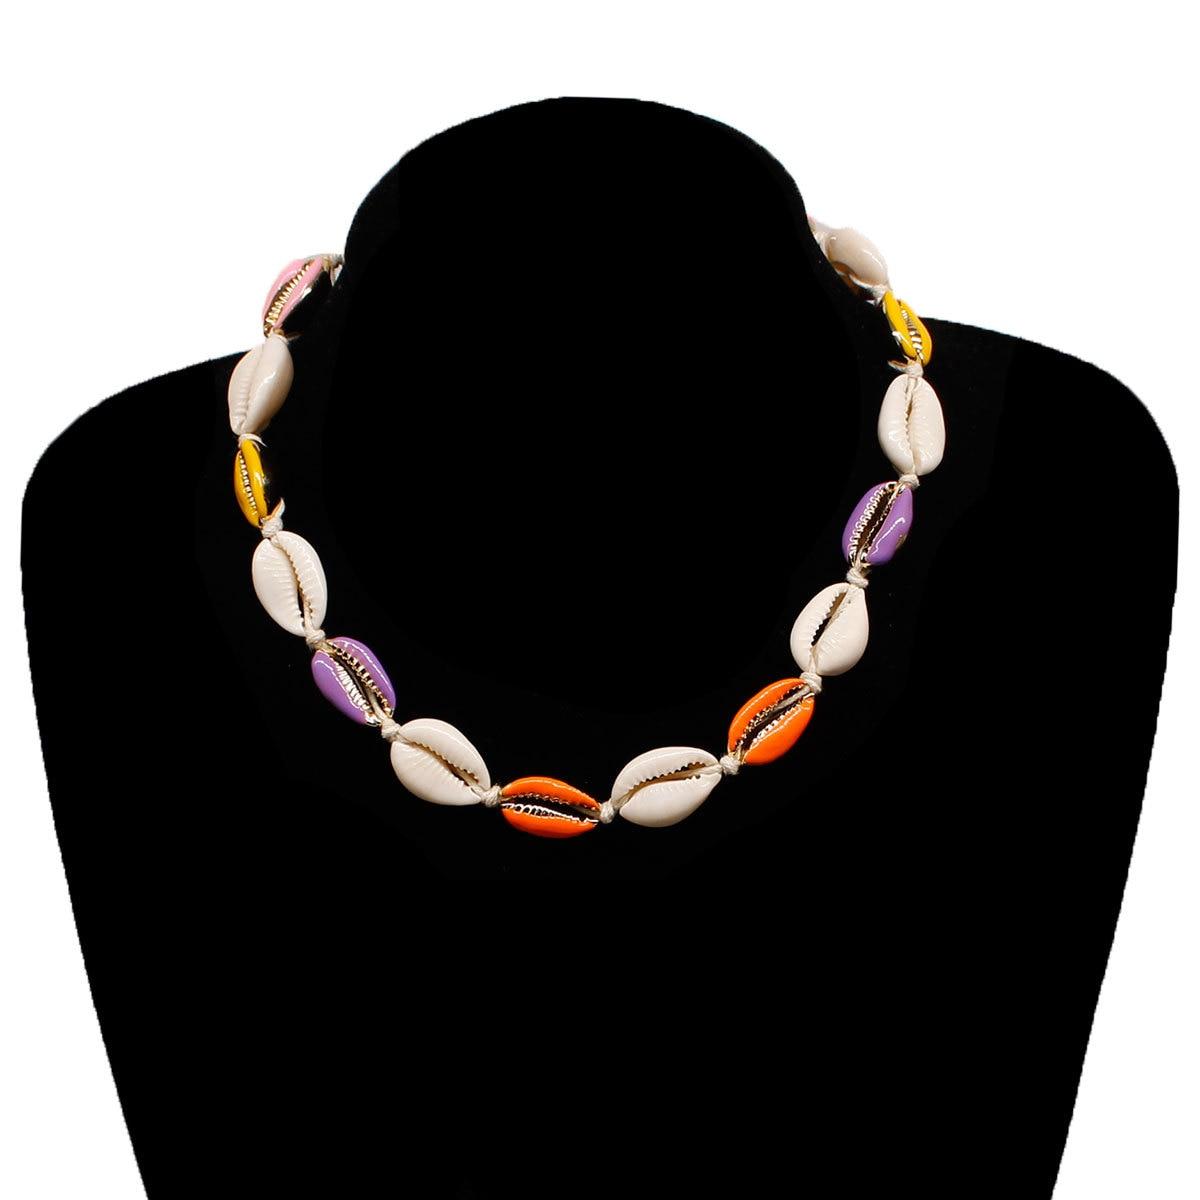 2 Pcs Set Bohemian Summer Beach Shell Necklace Rope Chain Pearl Colorful Metal Shell Choker Necklace Jewelry in Choker Necklaces from Jewelry Accessories